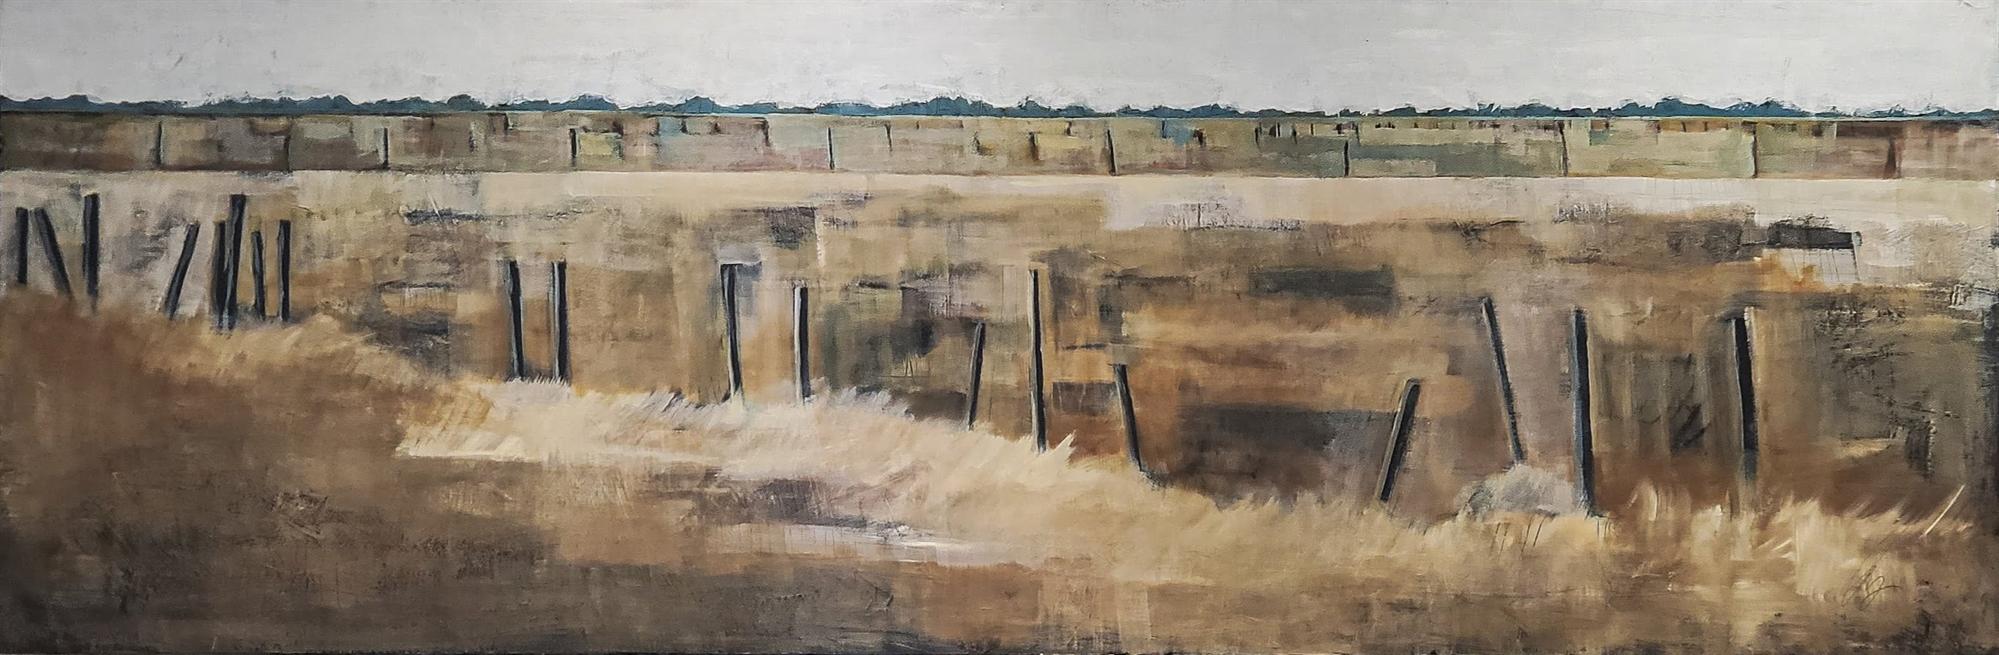 Texas Danube by Rachel Dory